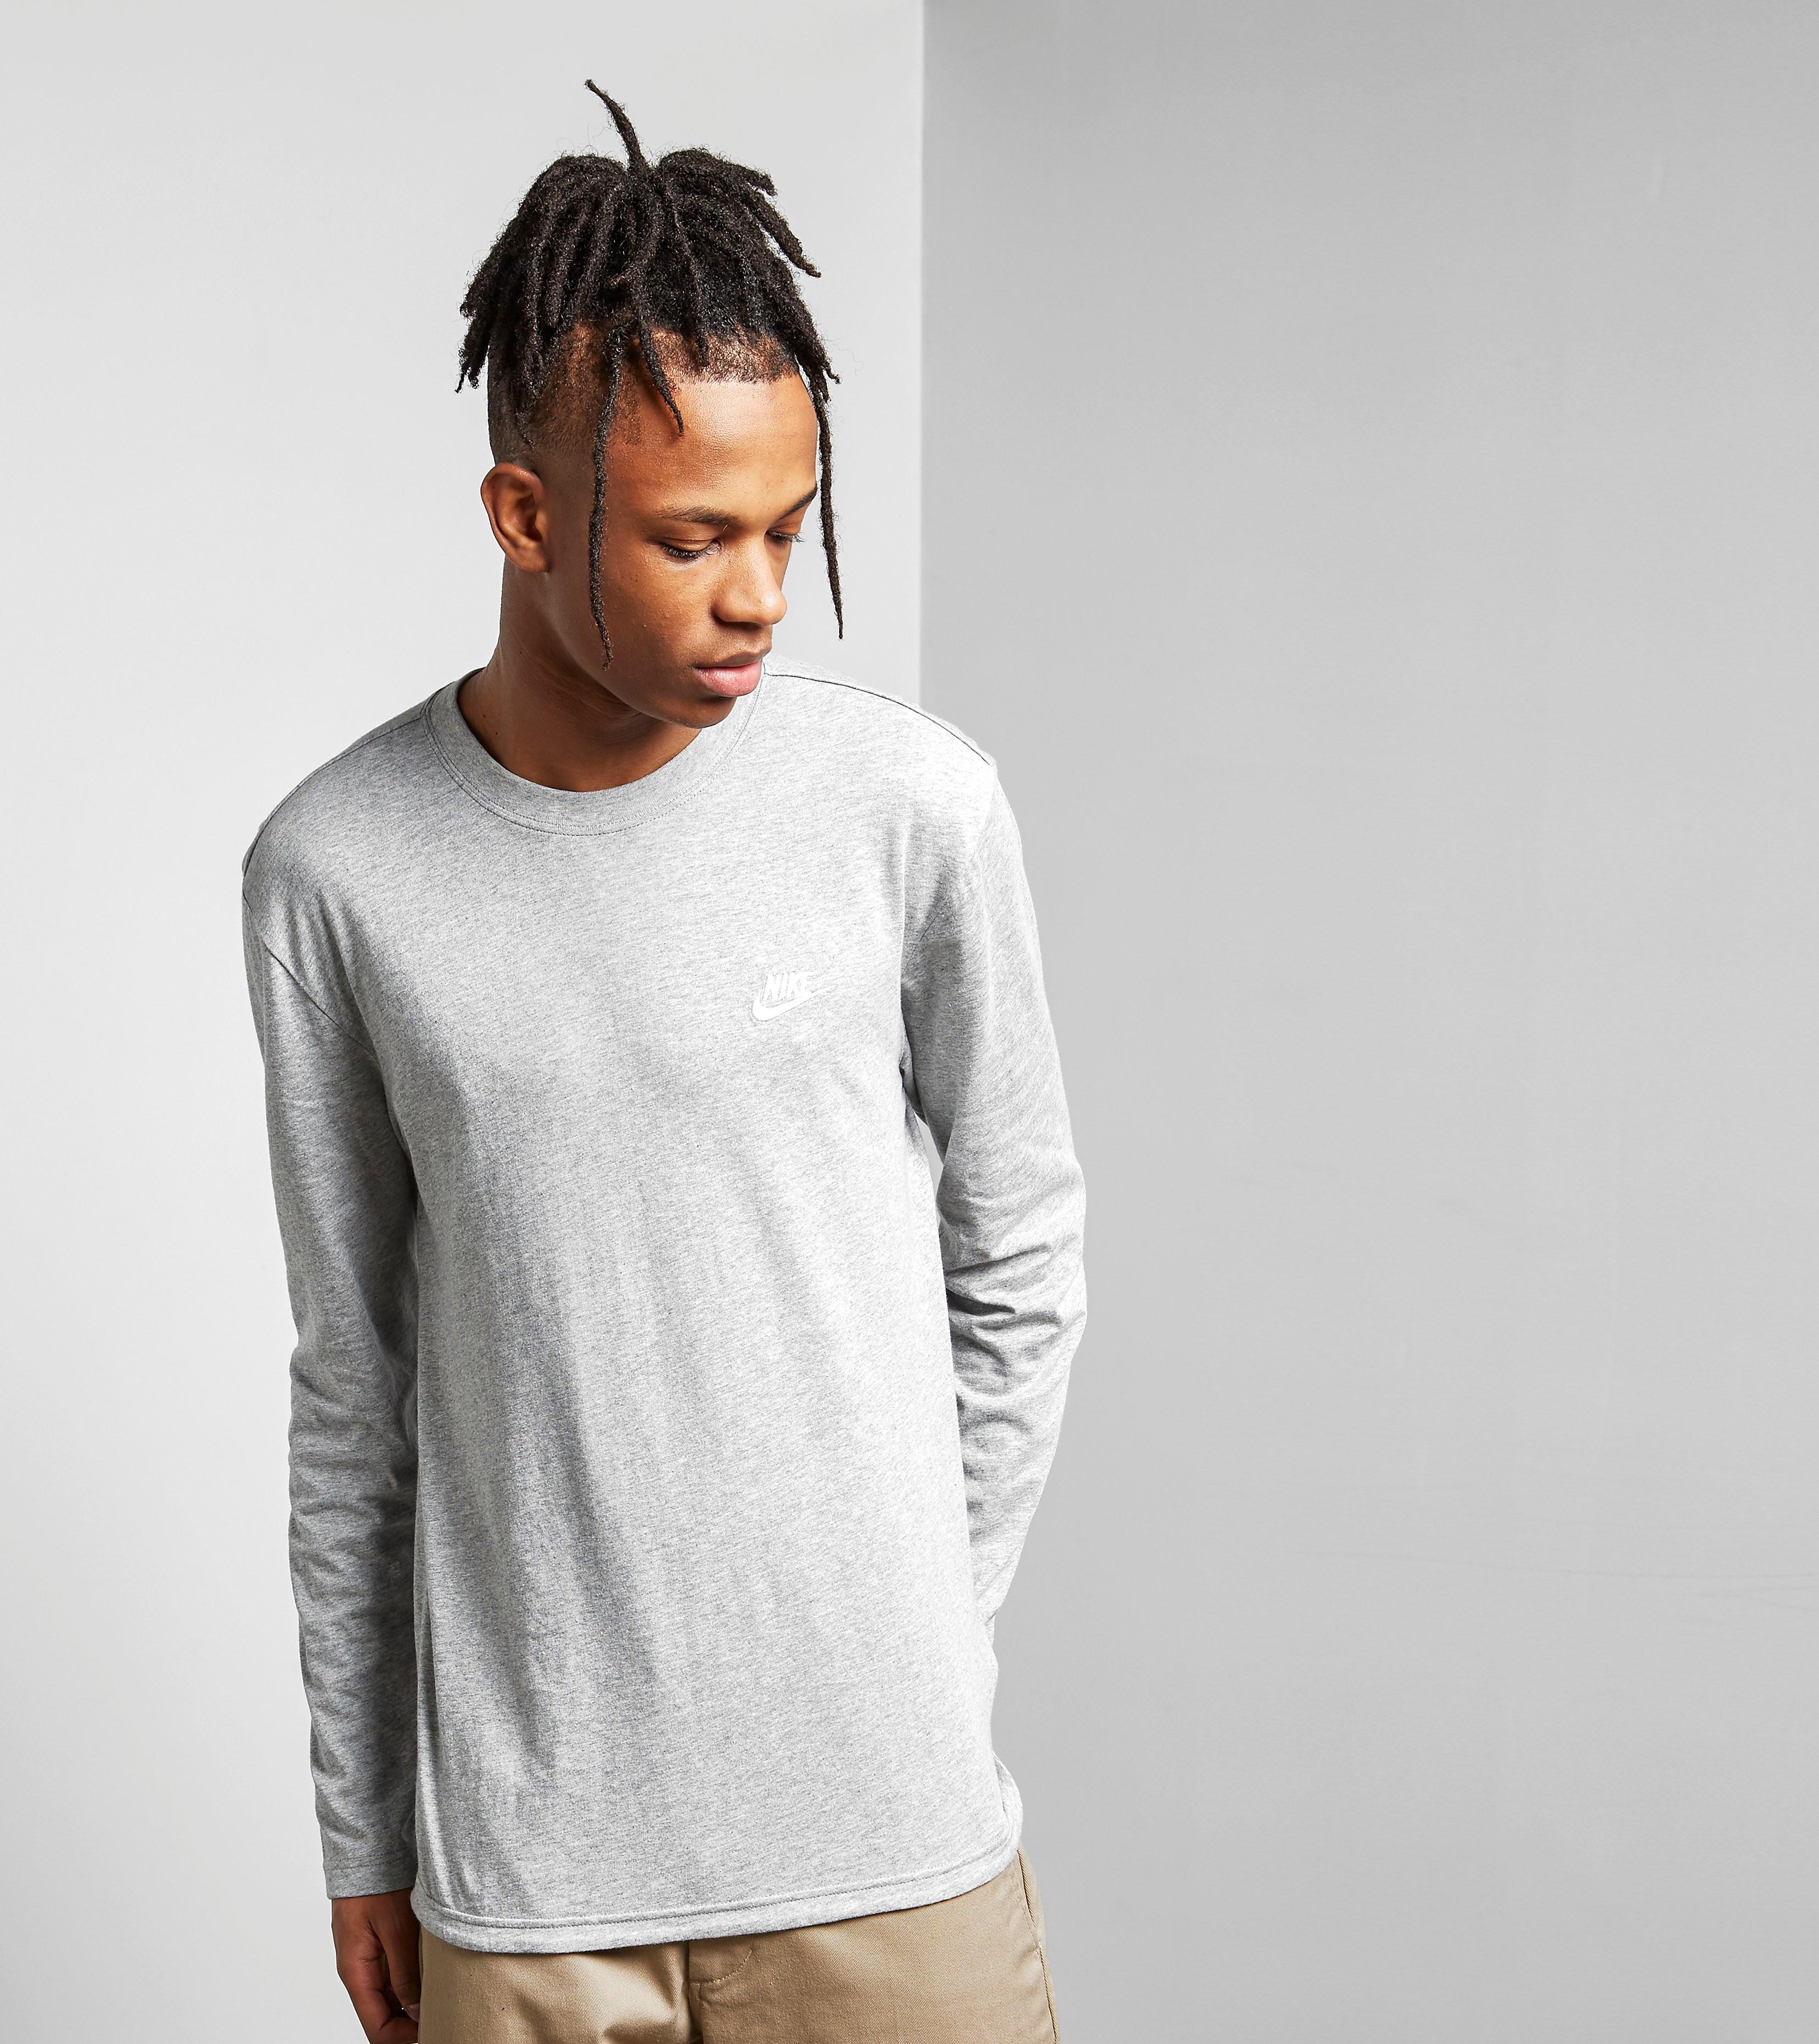 Nike Long-Sleeved Logo T-Shirt